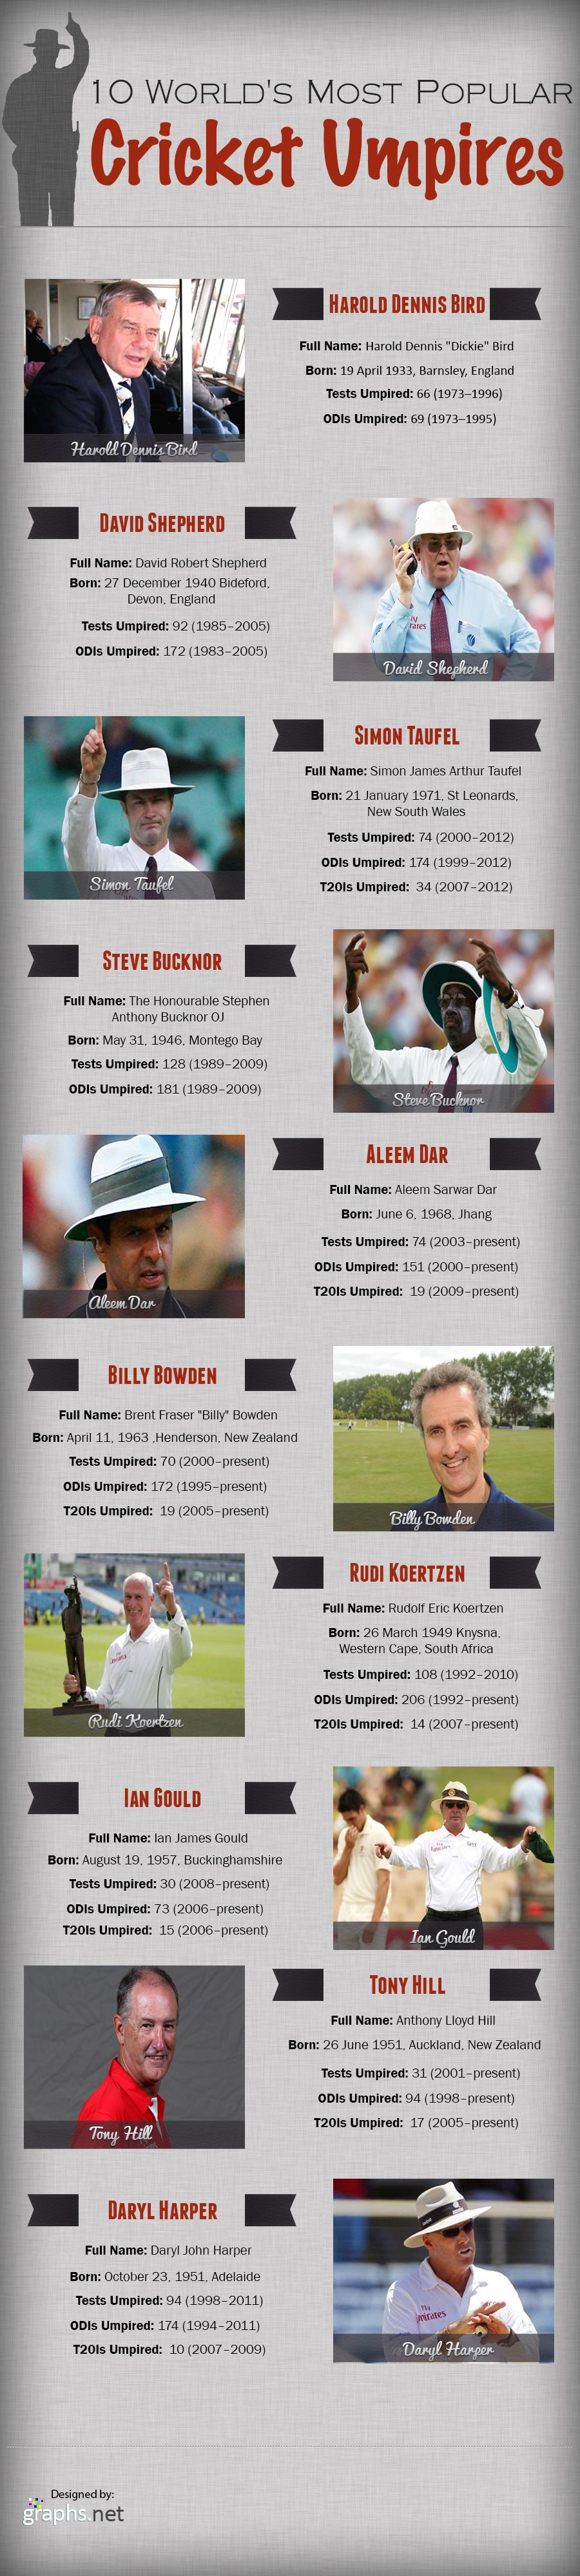 Top 10 Umpires in International Cricket